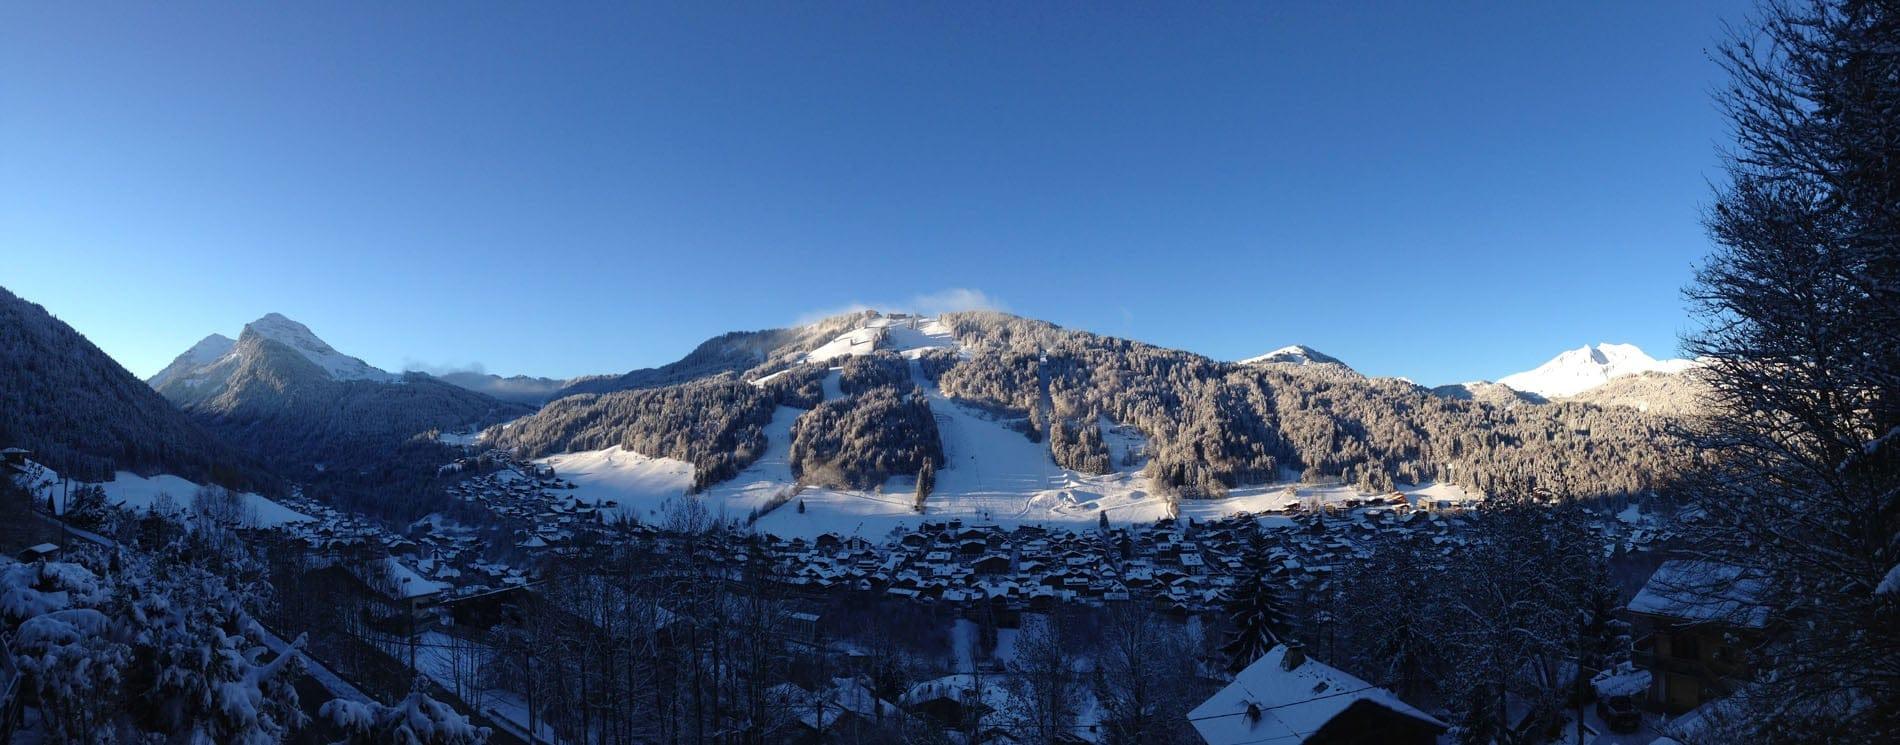 Morzine Snowy Mountain